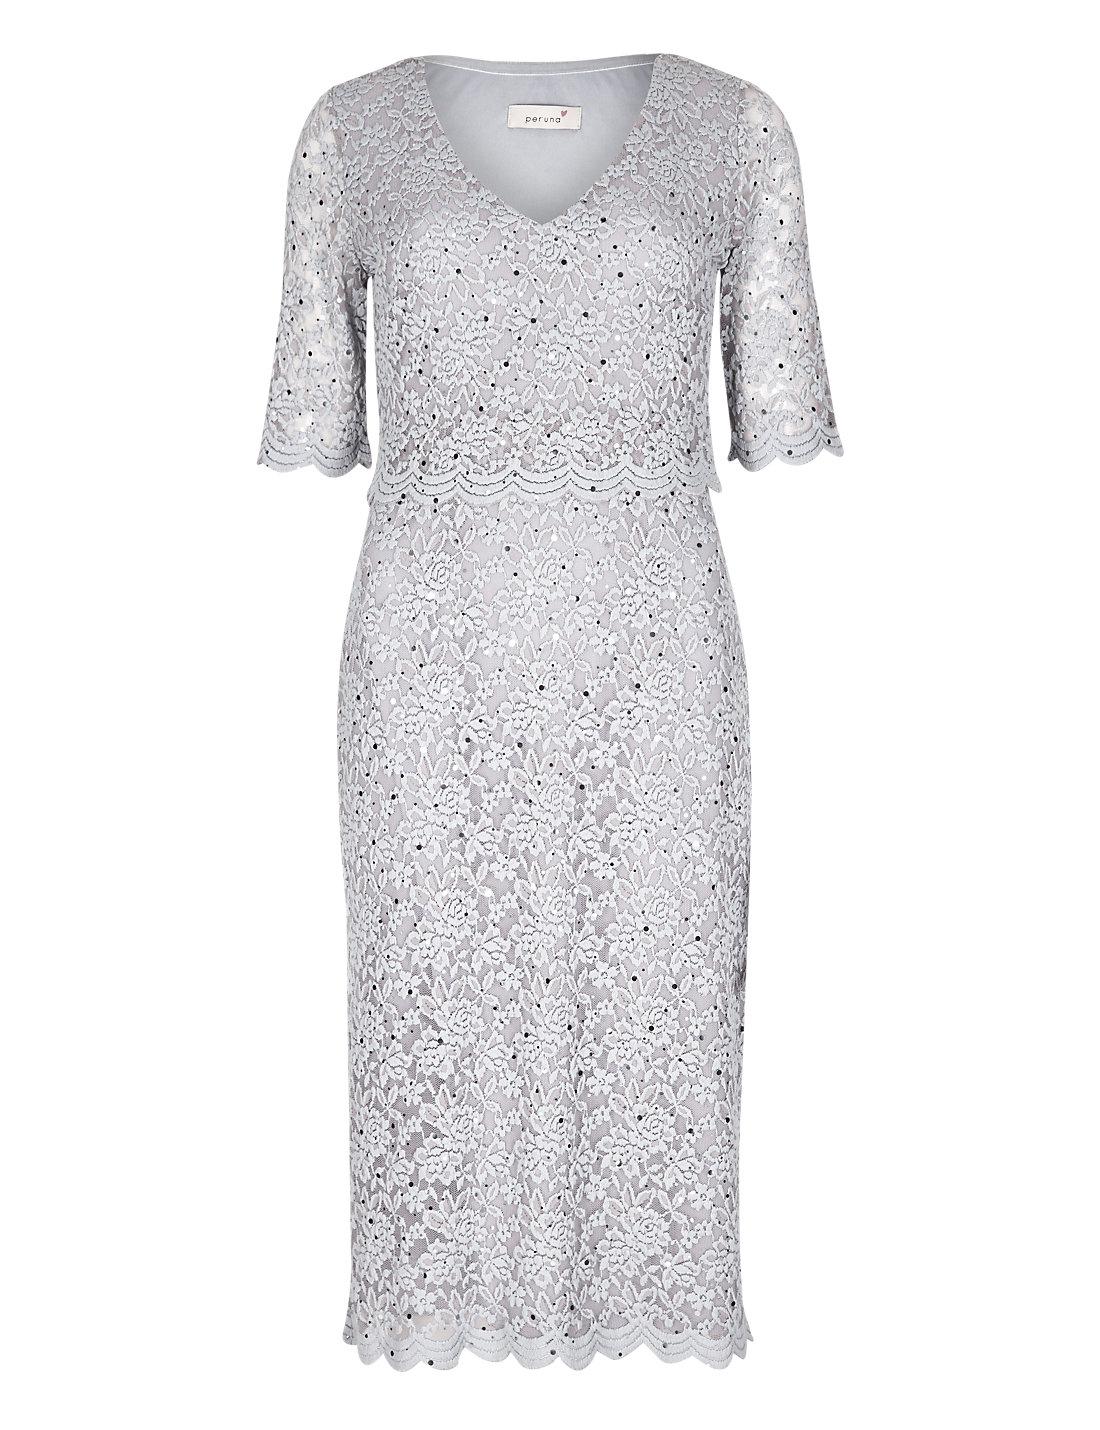 Per Una Black Dress Part - 17: Double Layered Scallop Floral Lace Dress